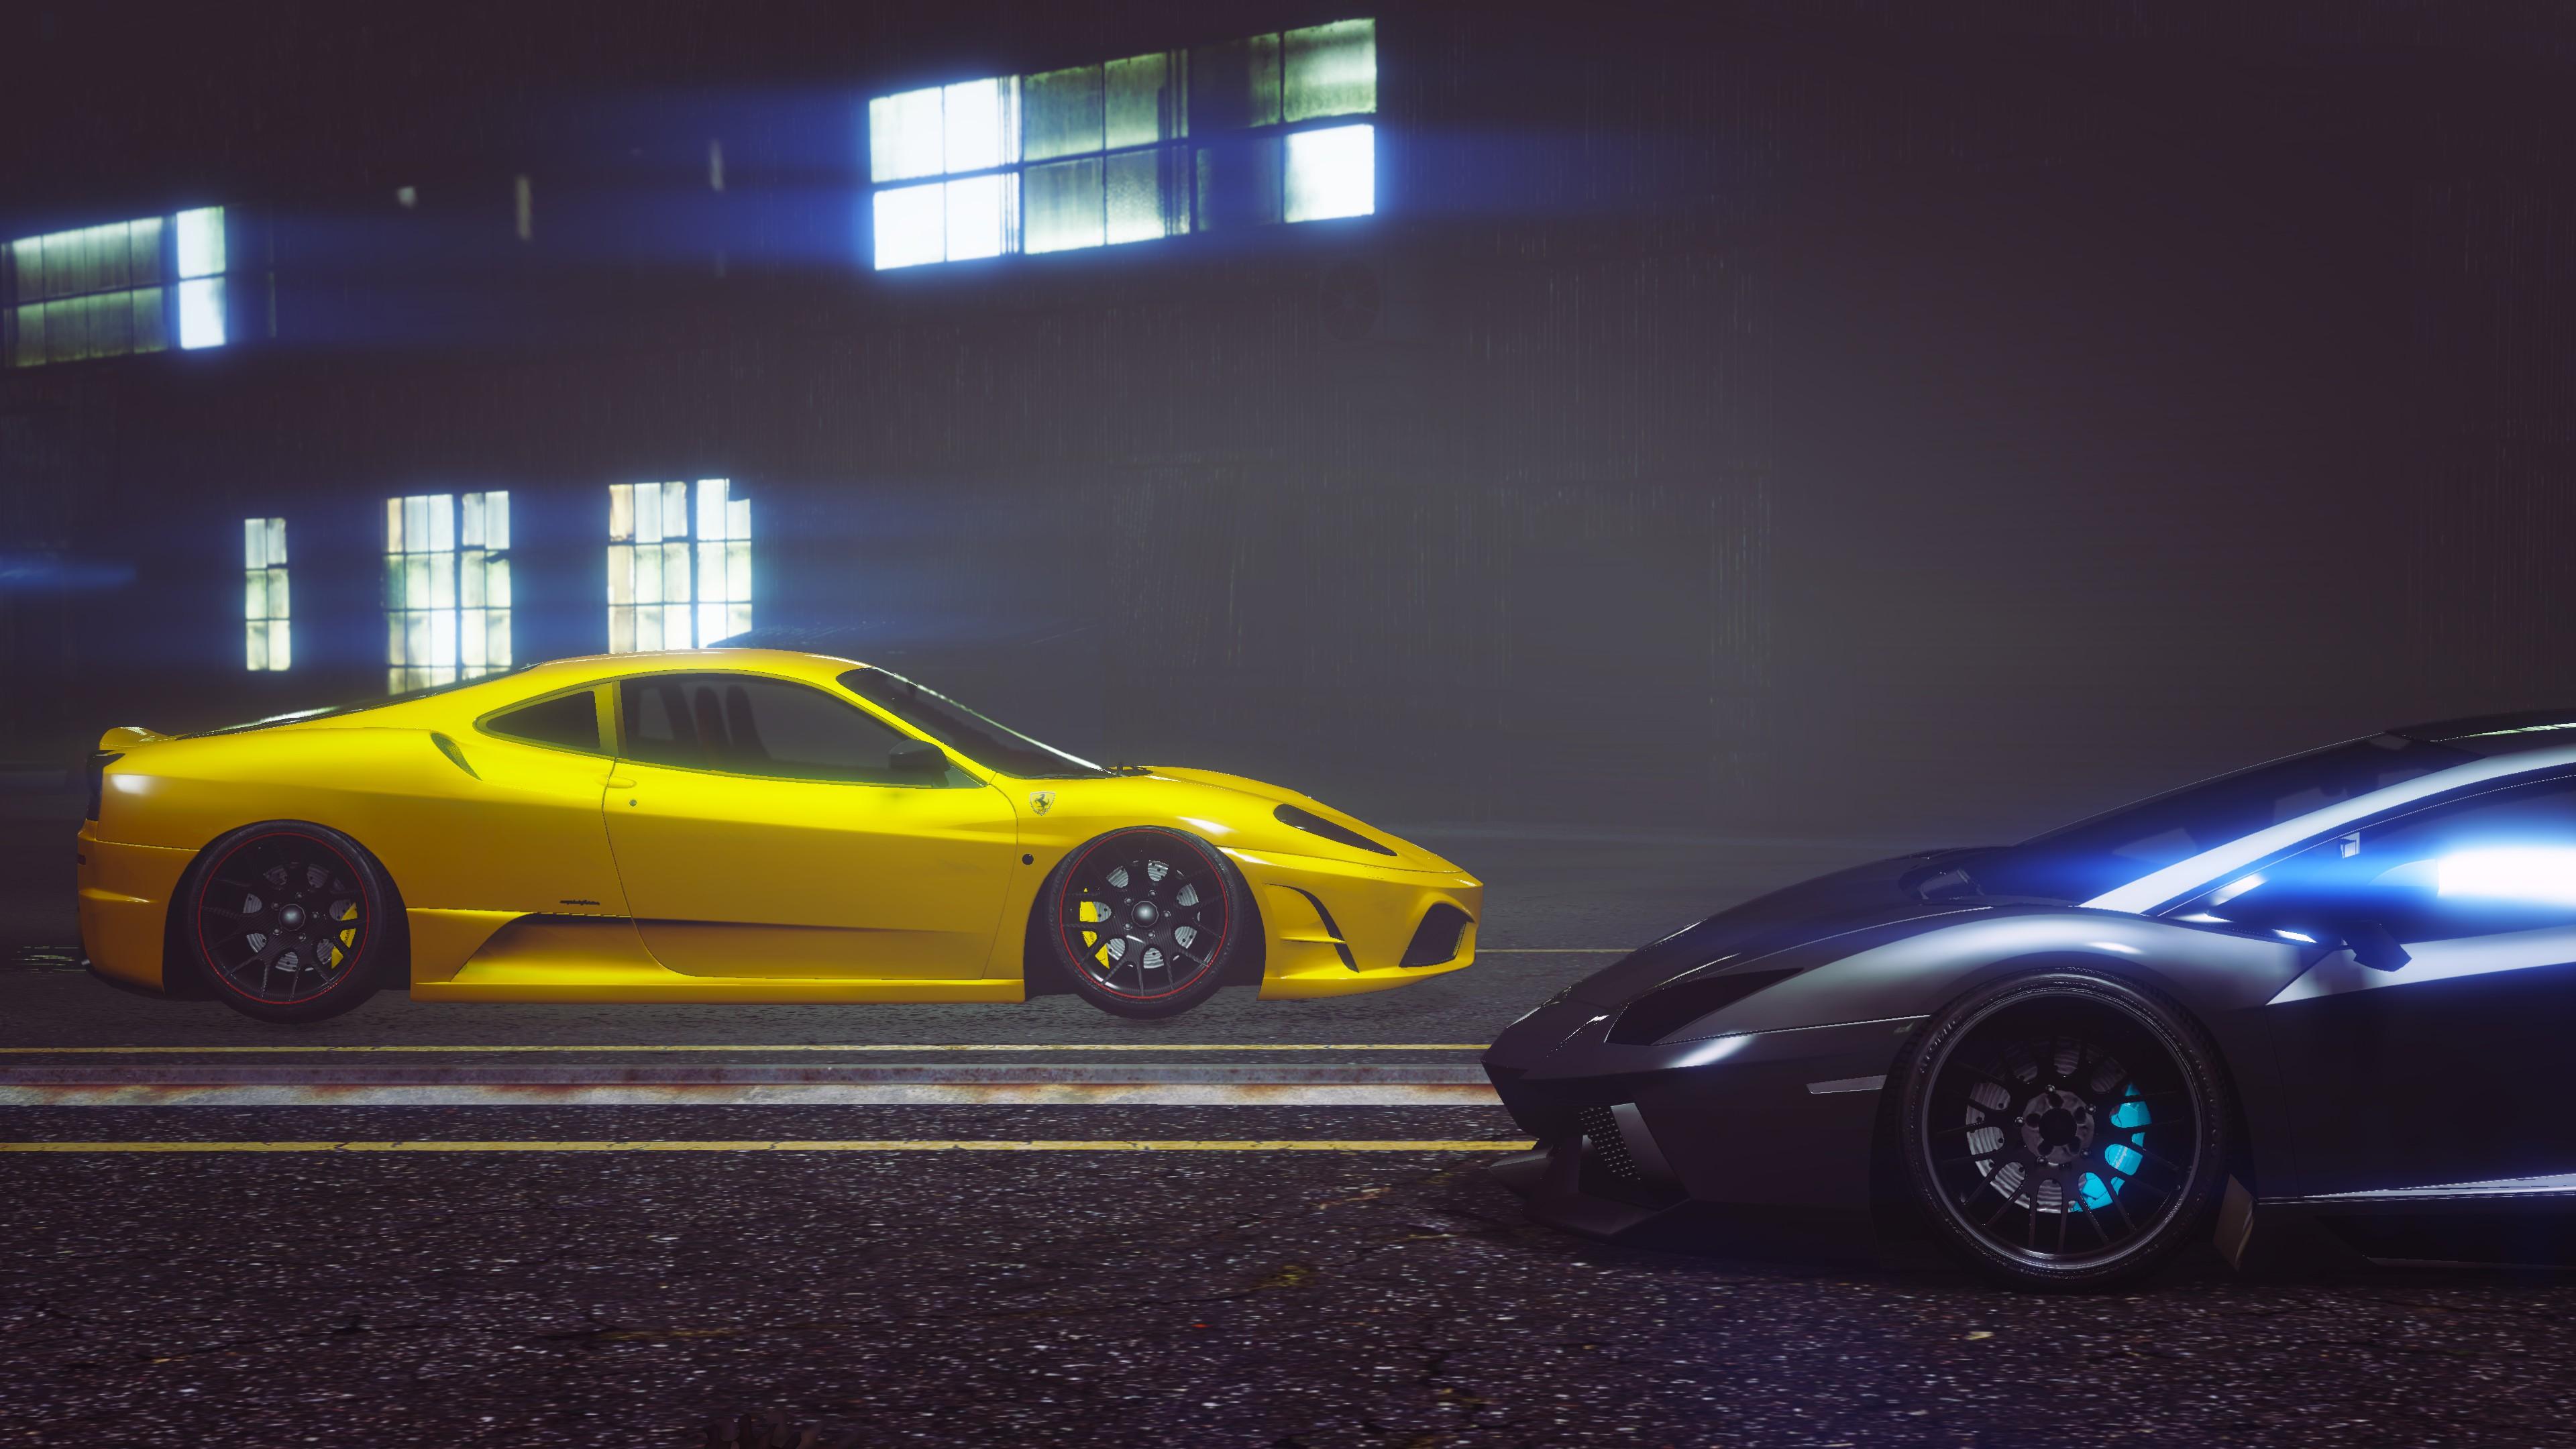 By Photo Congress || Gta San Andreas Real Cars Mod Pc